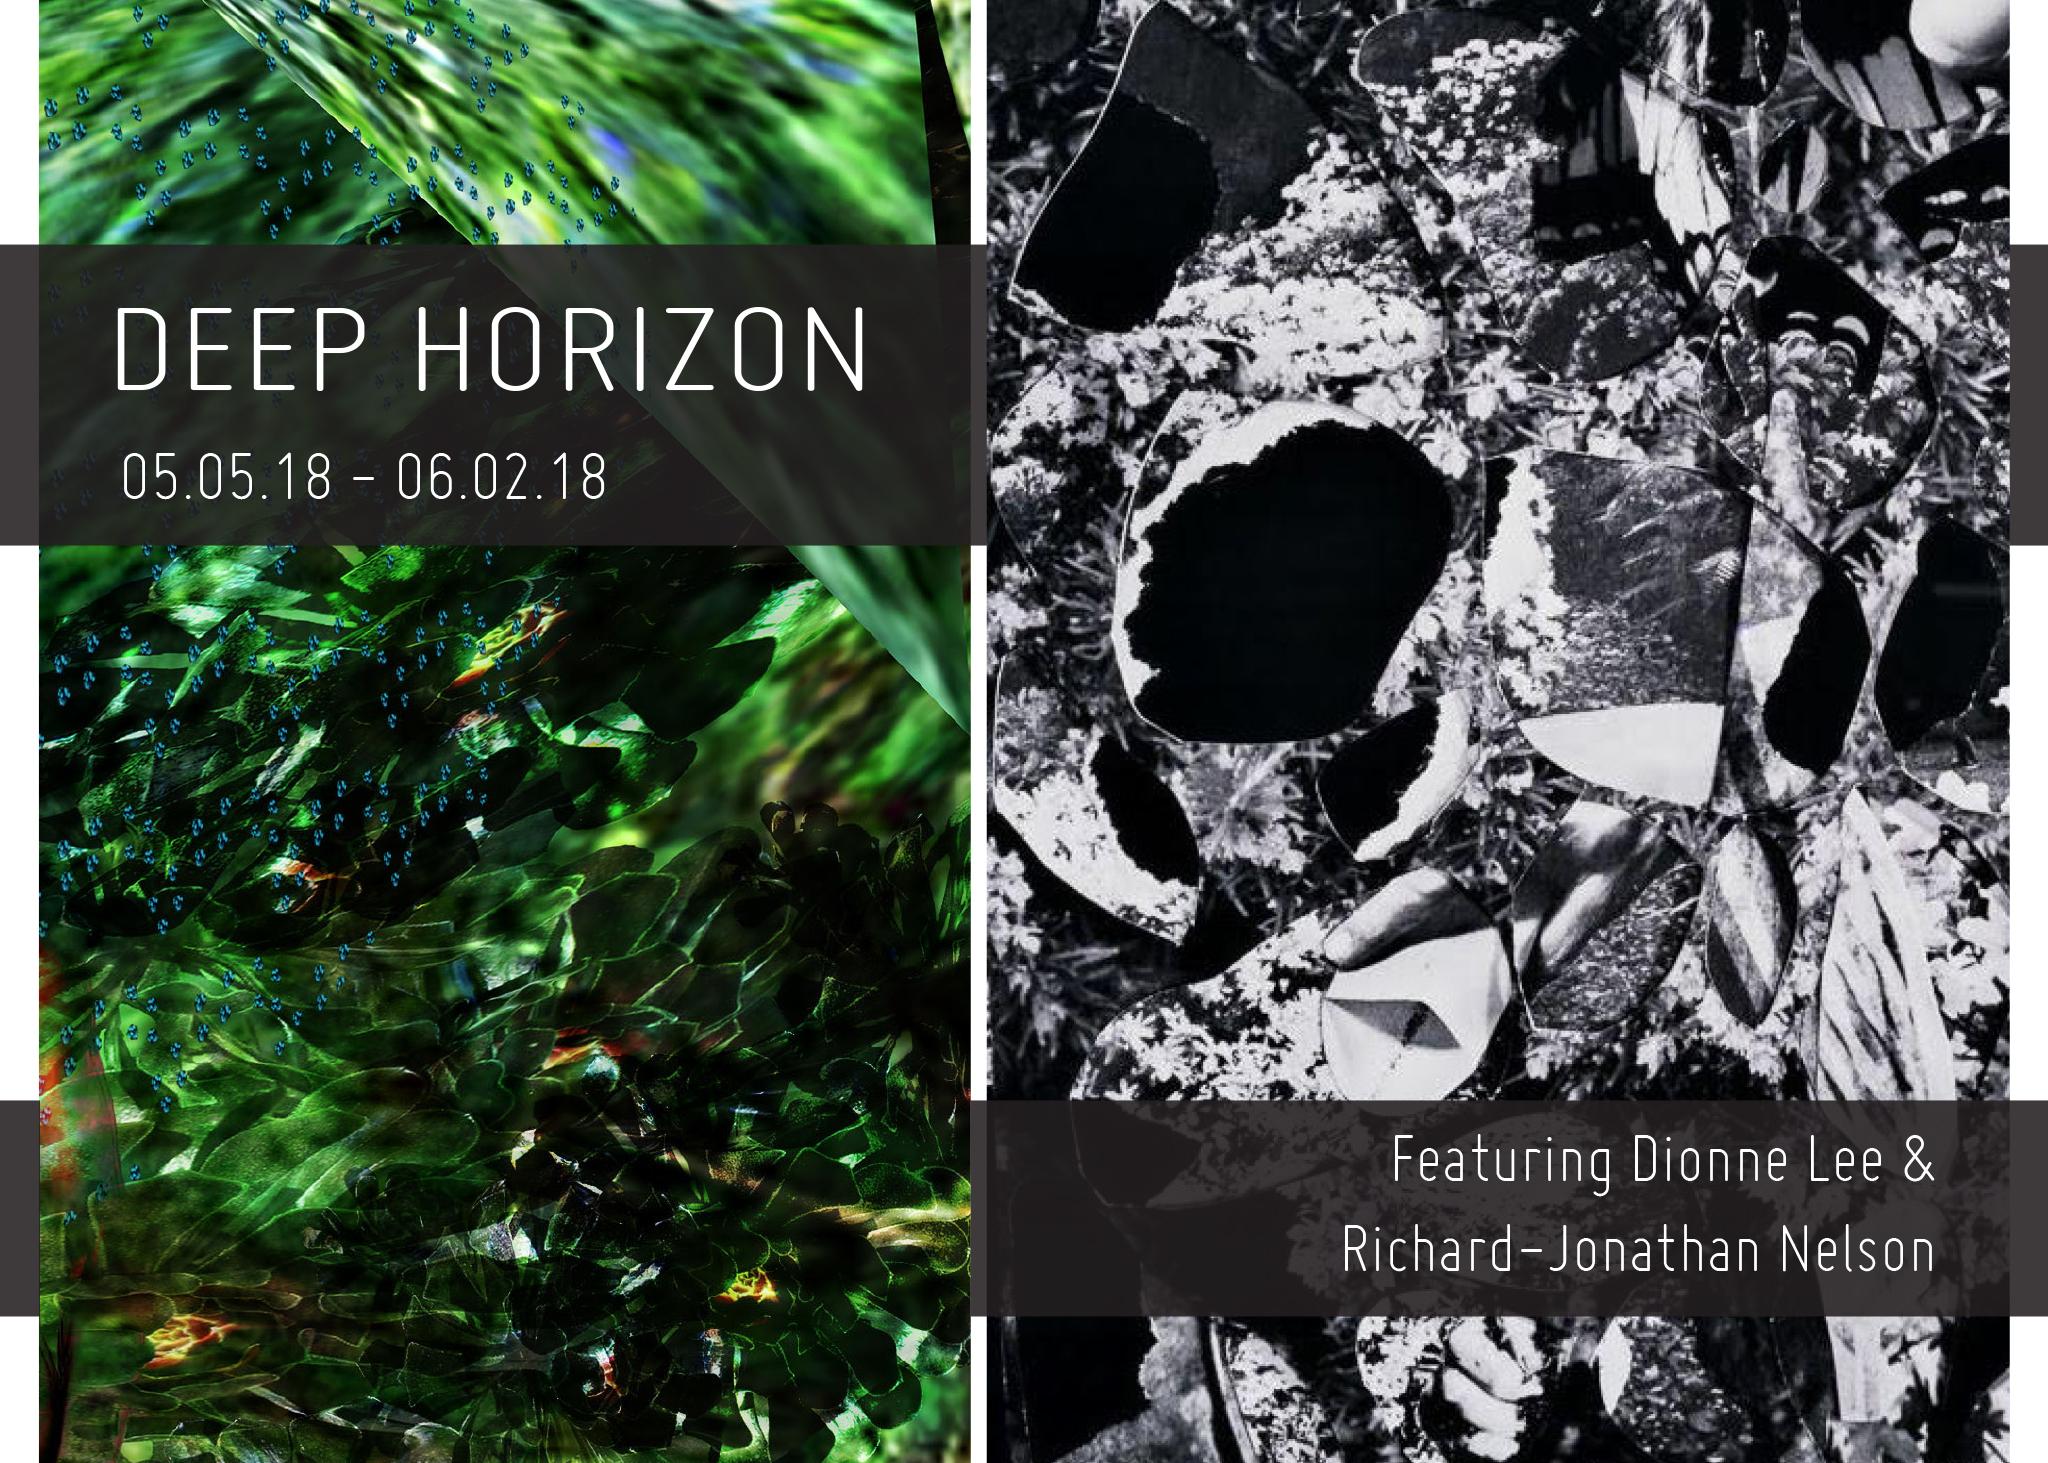 Deep Horizon   05.05.18-06.02.18